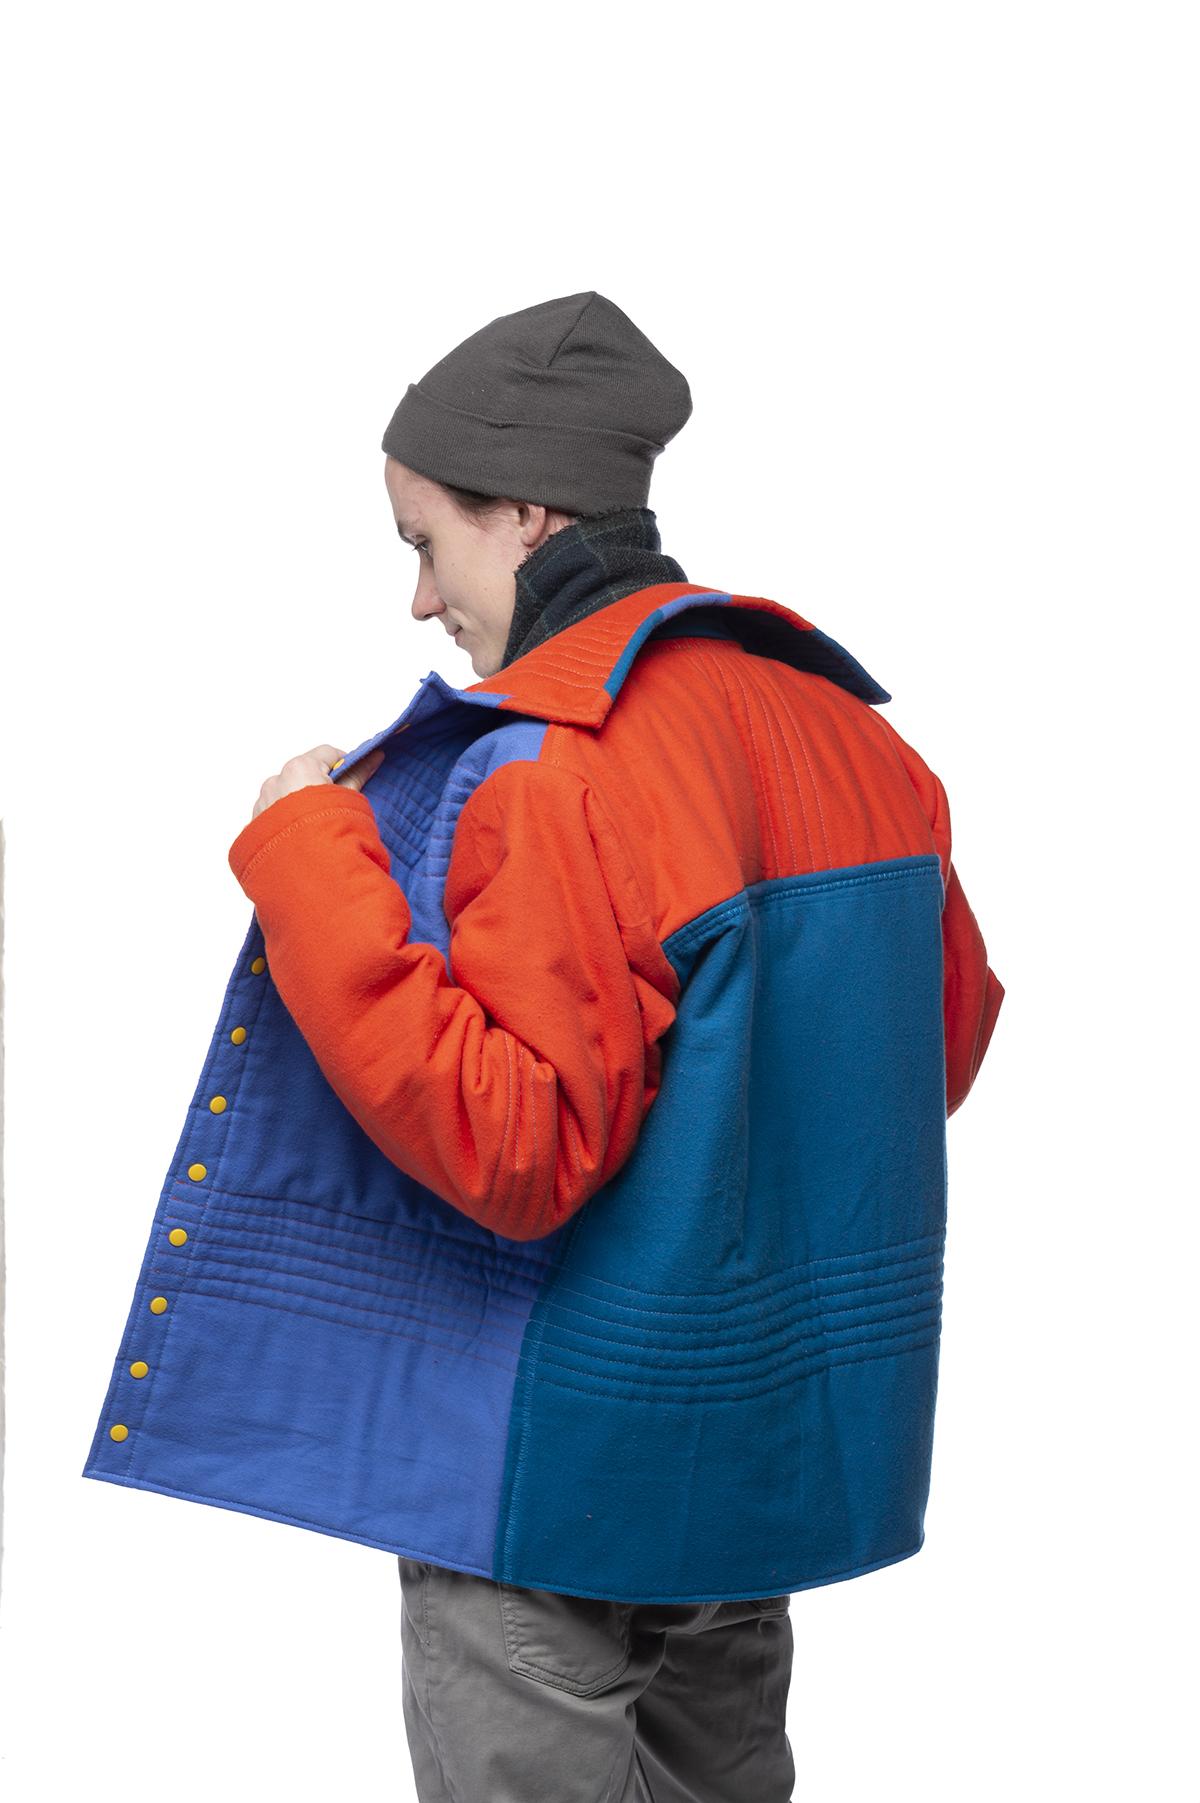 A design of a vibrant blue and orange winter coat.